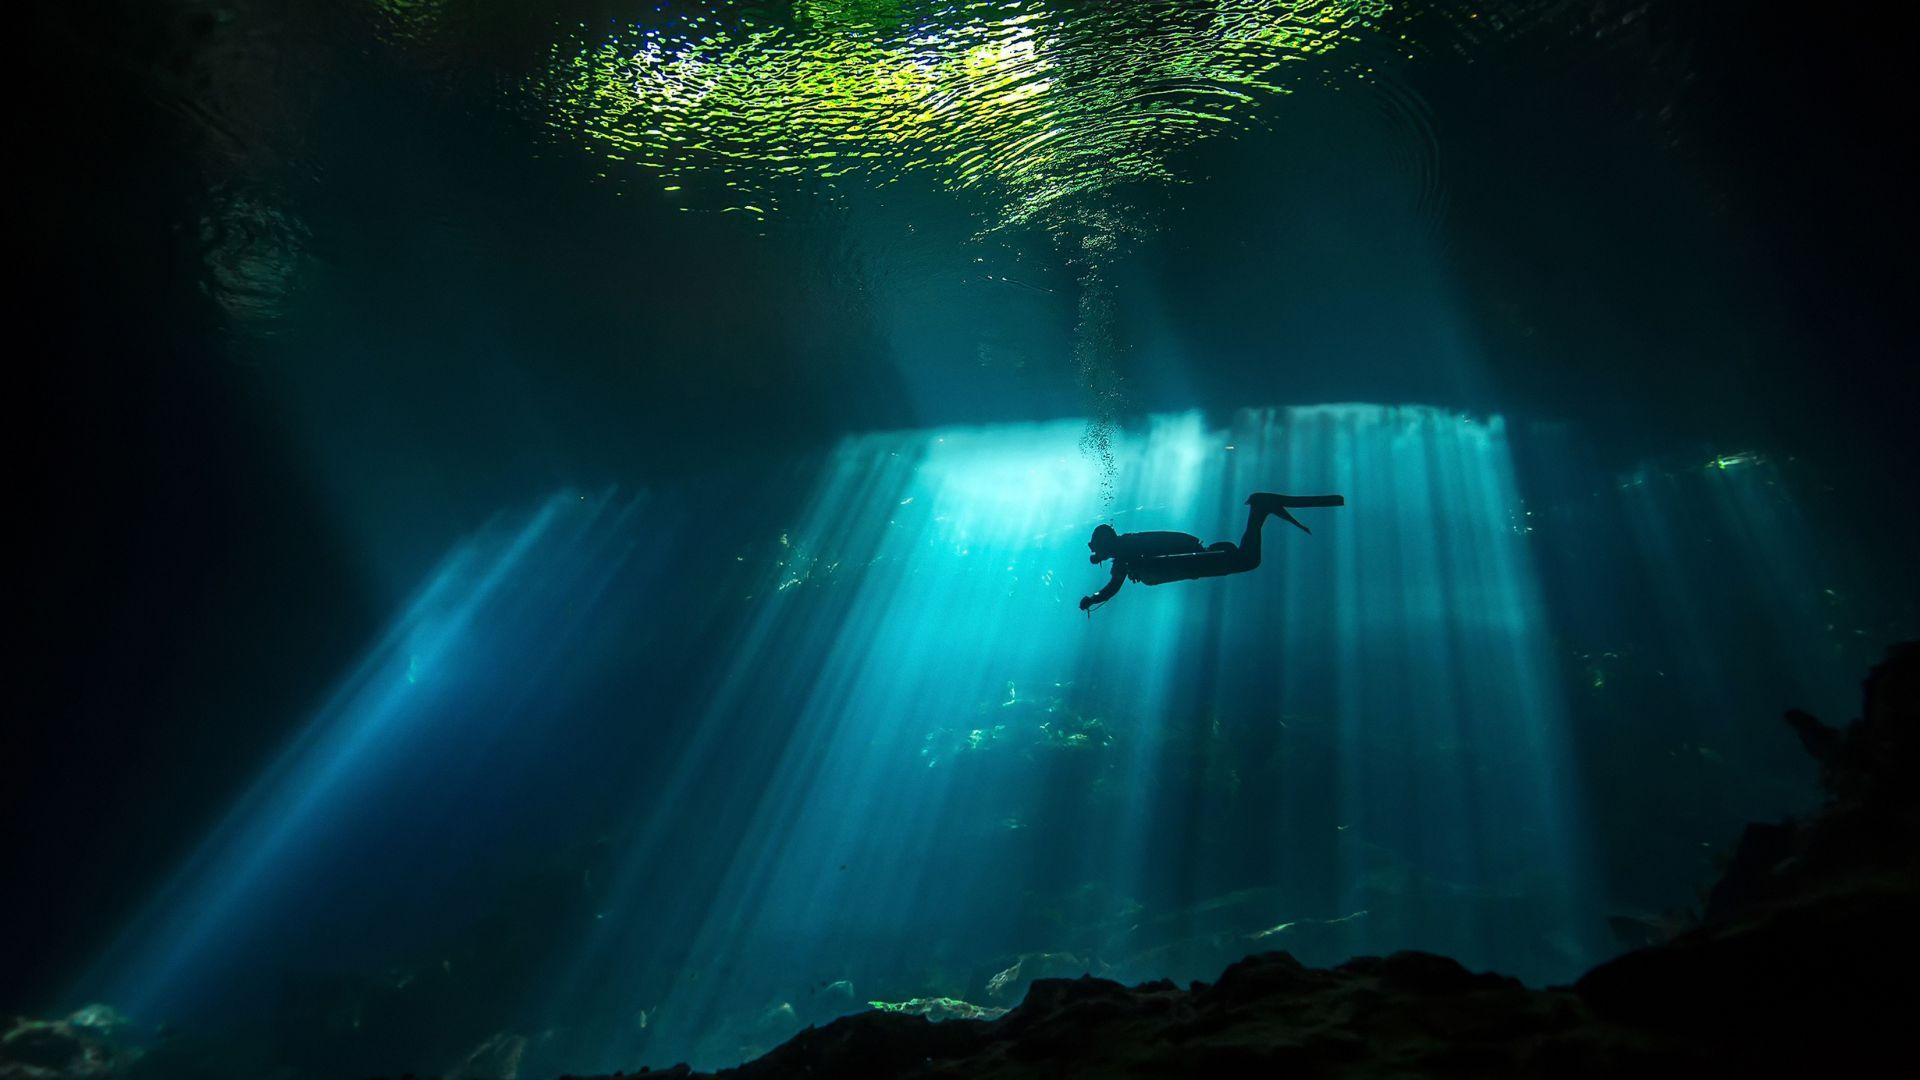 Wallpaper Diver, Sunbeam, Underwater, 4K, Travel 18736